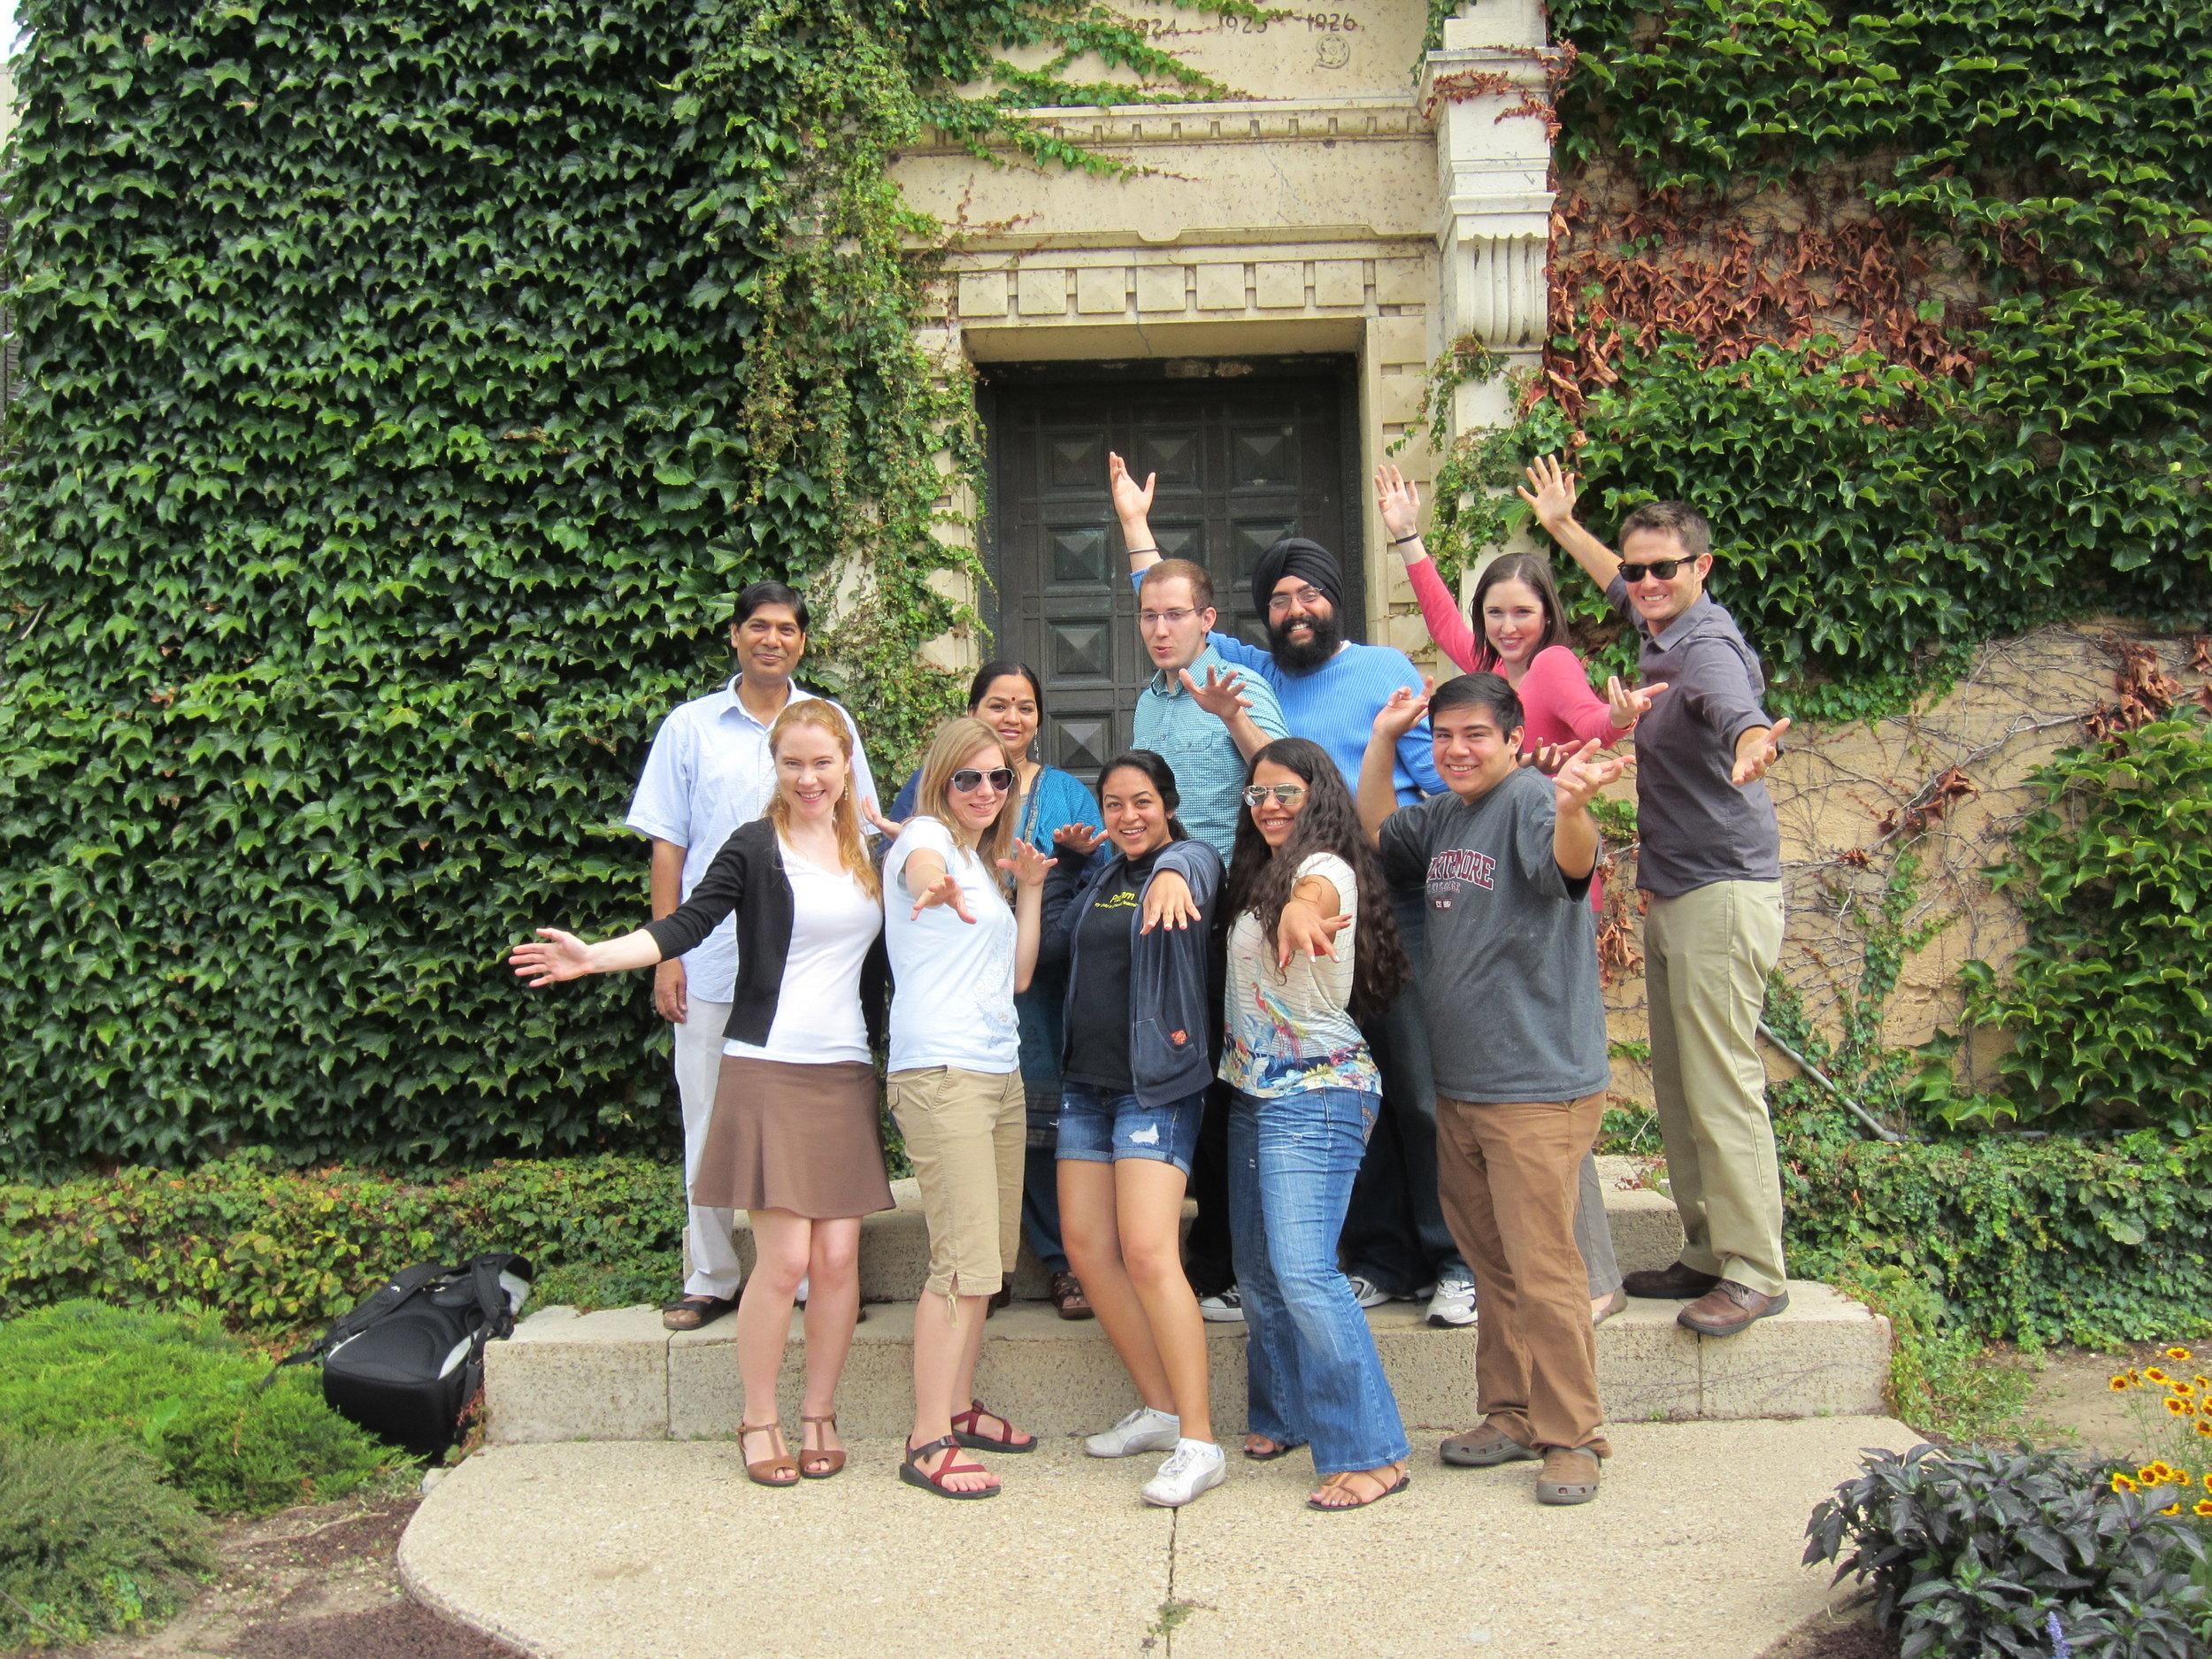 Sasli Students of Intermediate Hindi at UW Madison